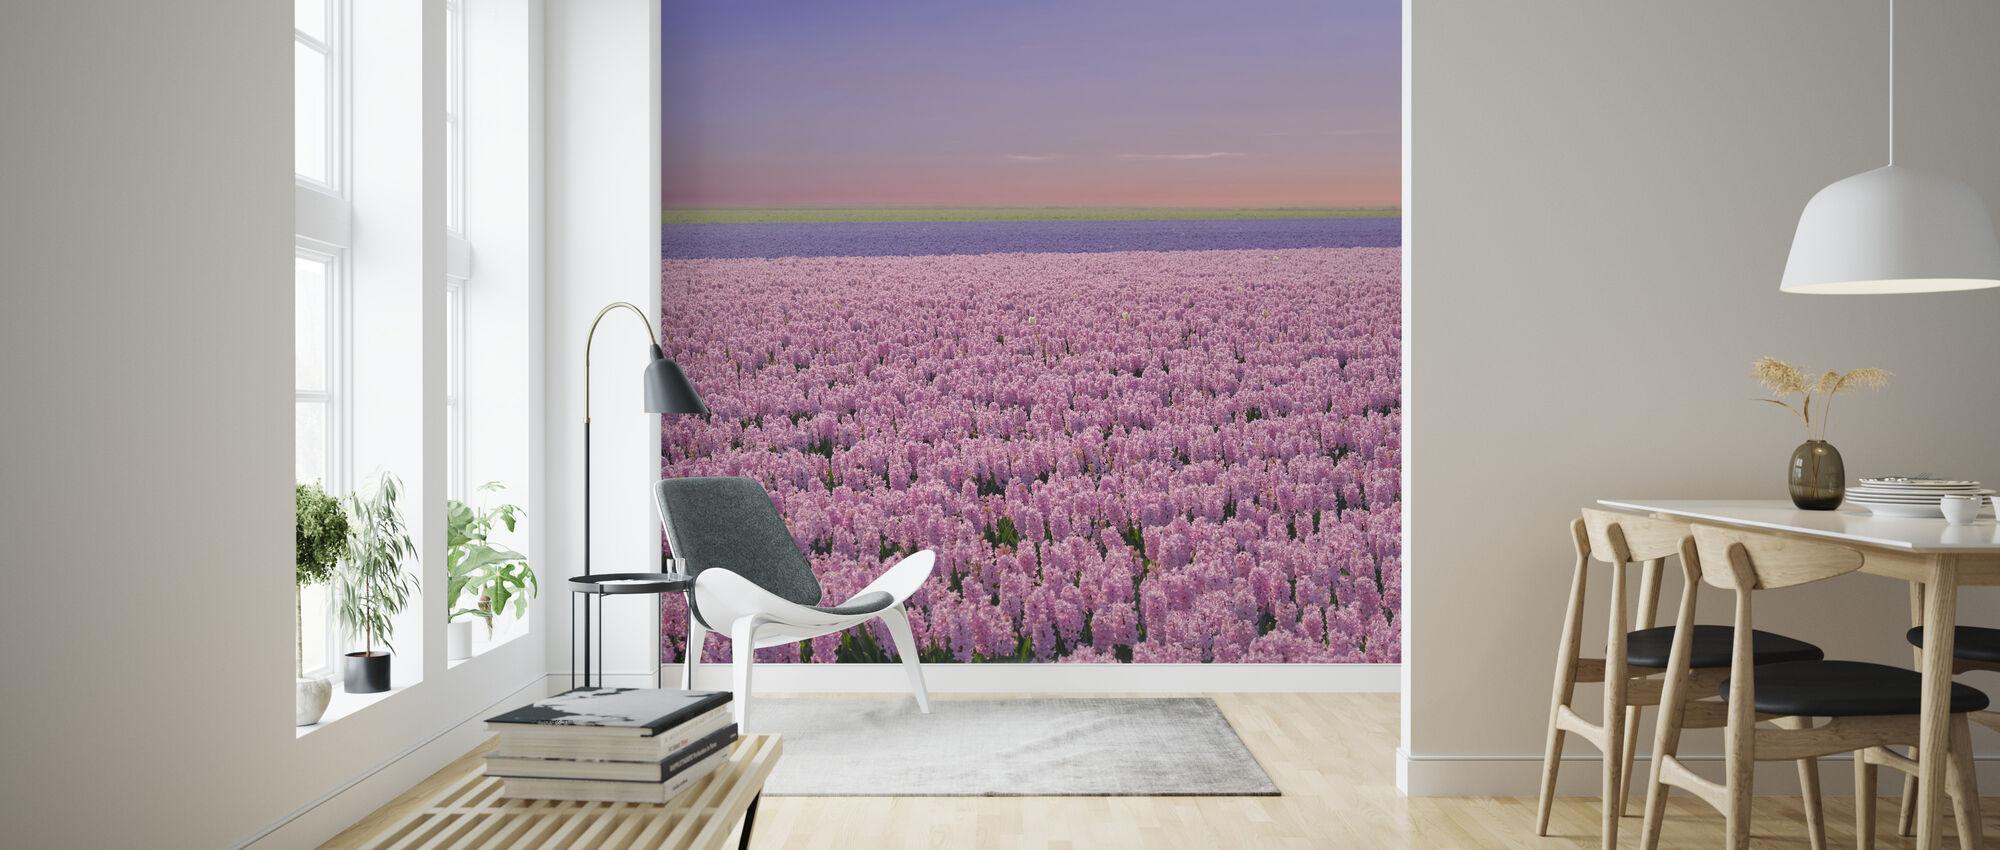 Hyacinthus Field - Wallpaper - Living Room